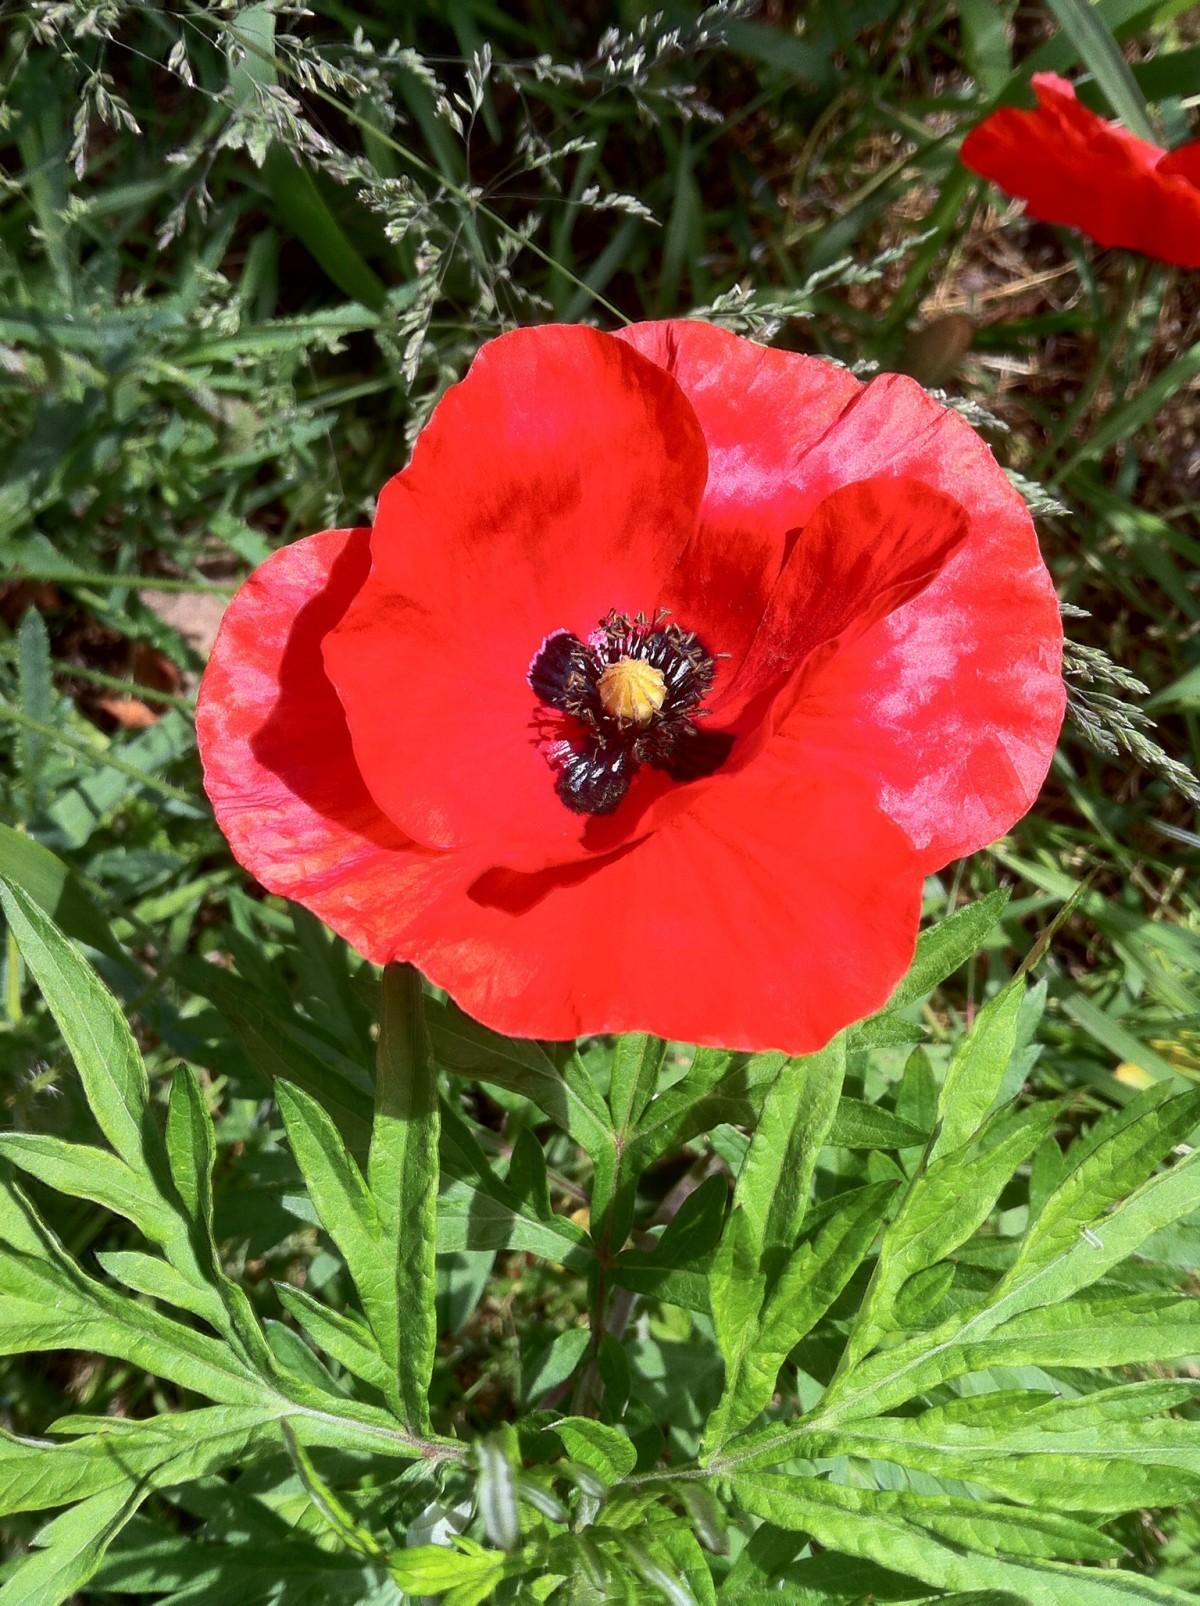 kostenlose foto natur blume bl tenblatt gr n rot schwarz flora klatschmohn mohnblume. Black Bedroom Furniture Sets. Home Design Ideas